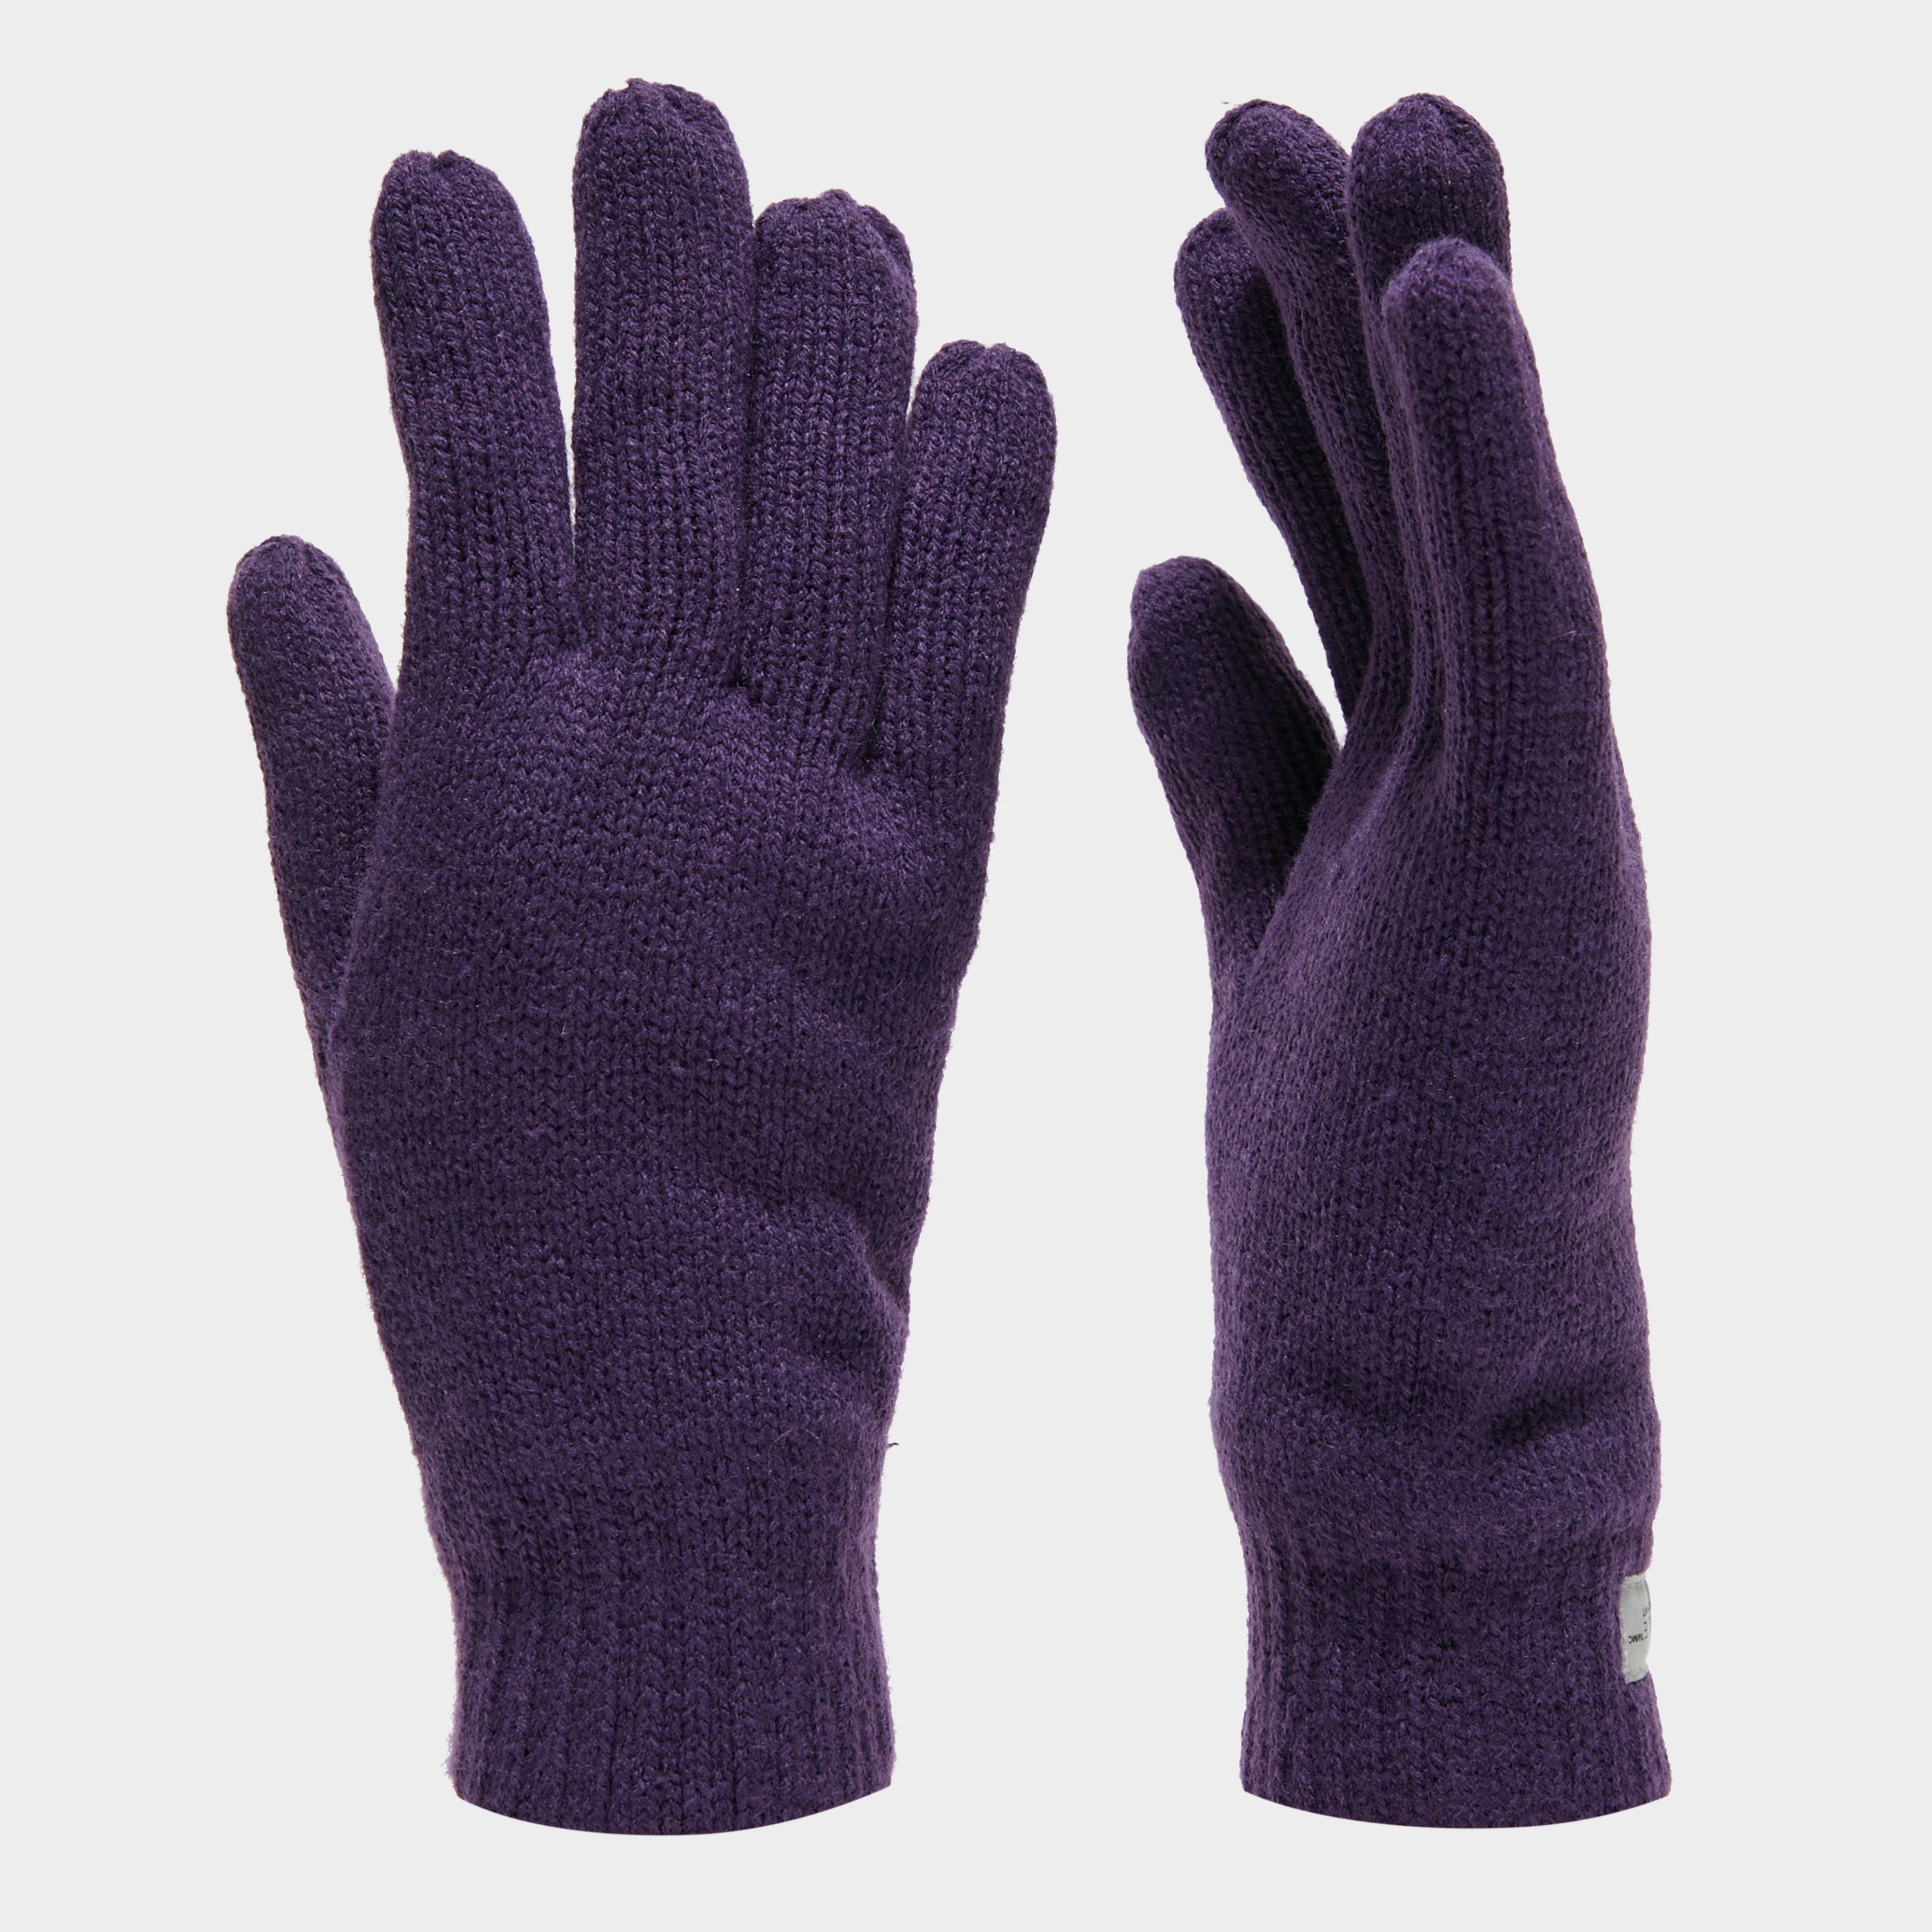 Peter Storm Thinsulate Knit Fleece Gloves - Purple, Purple